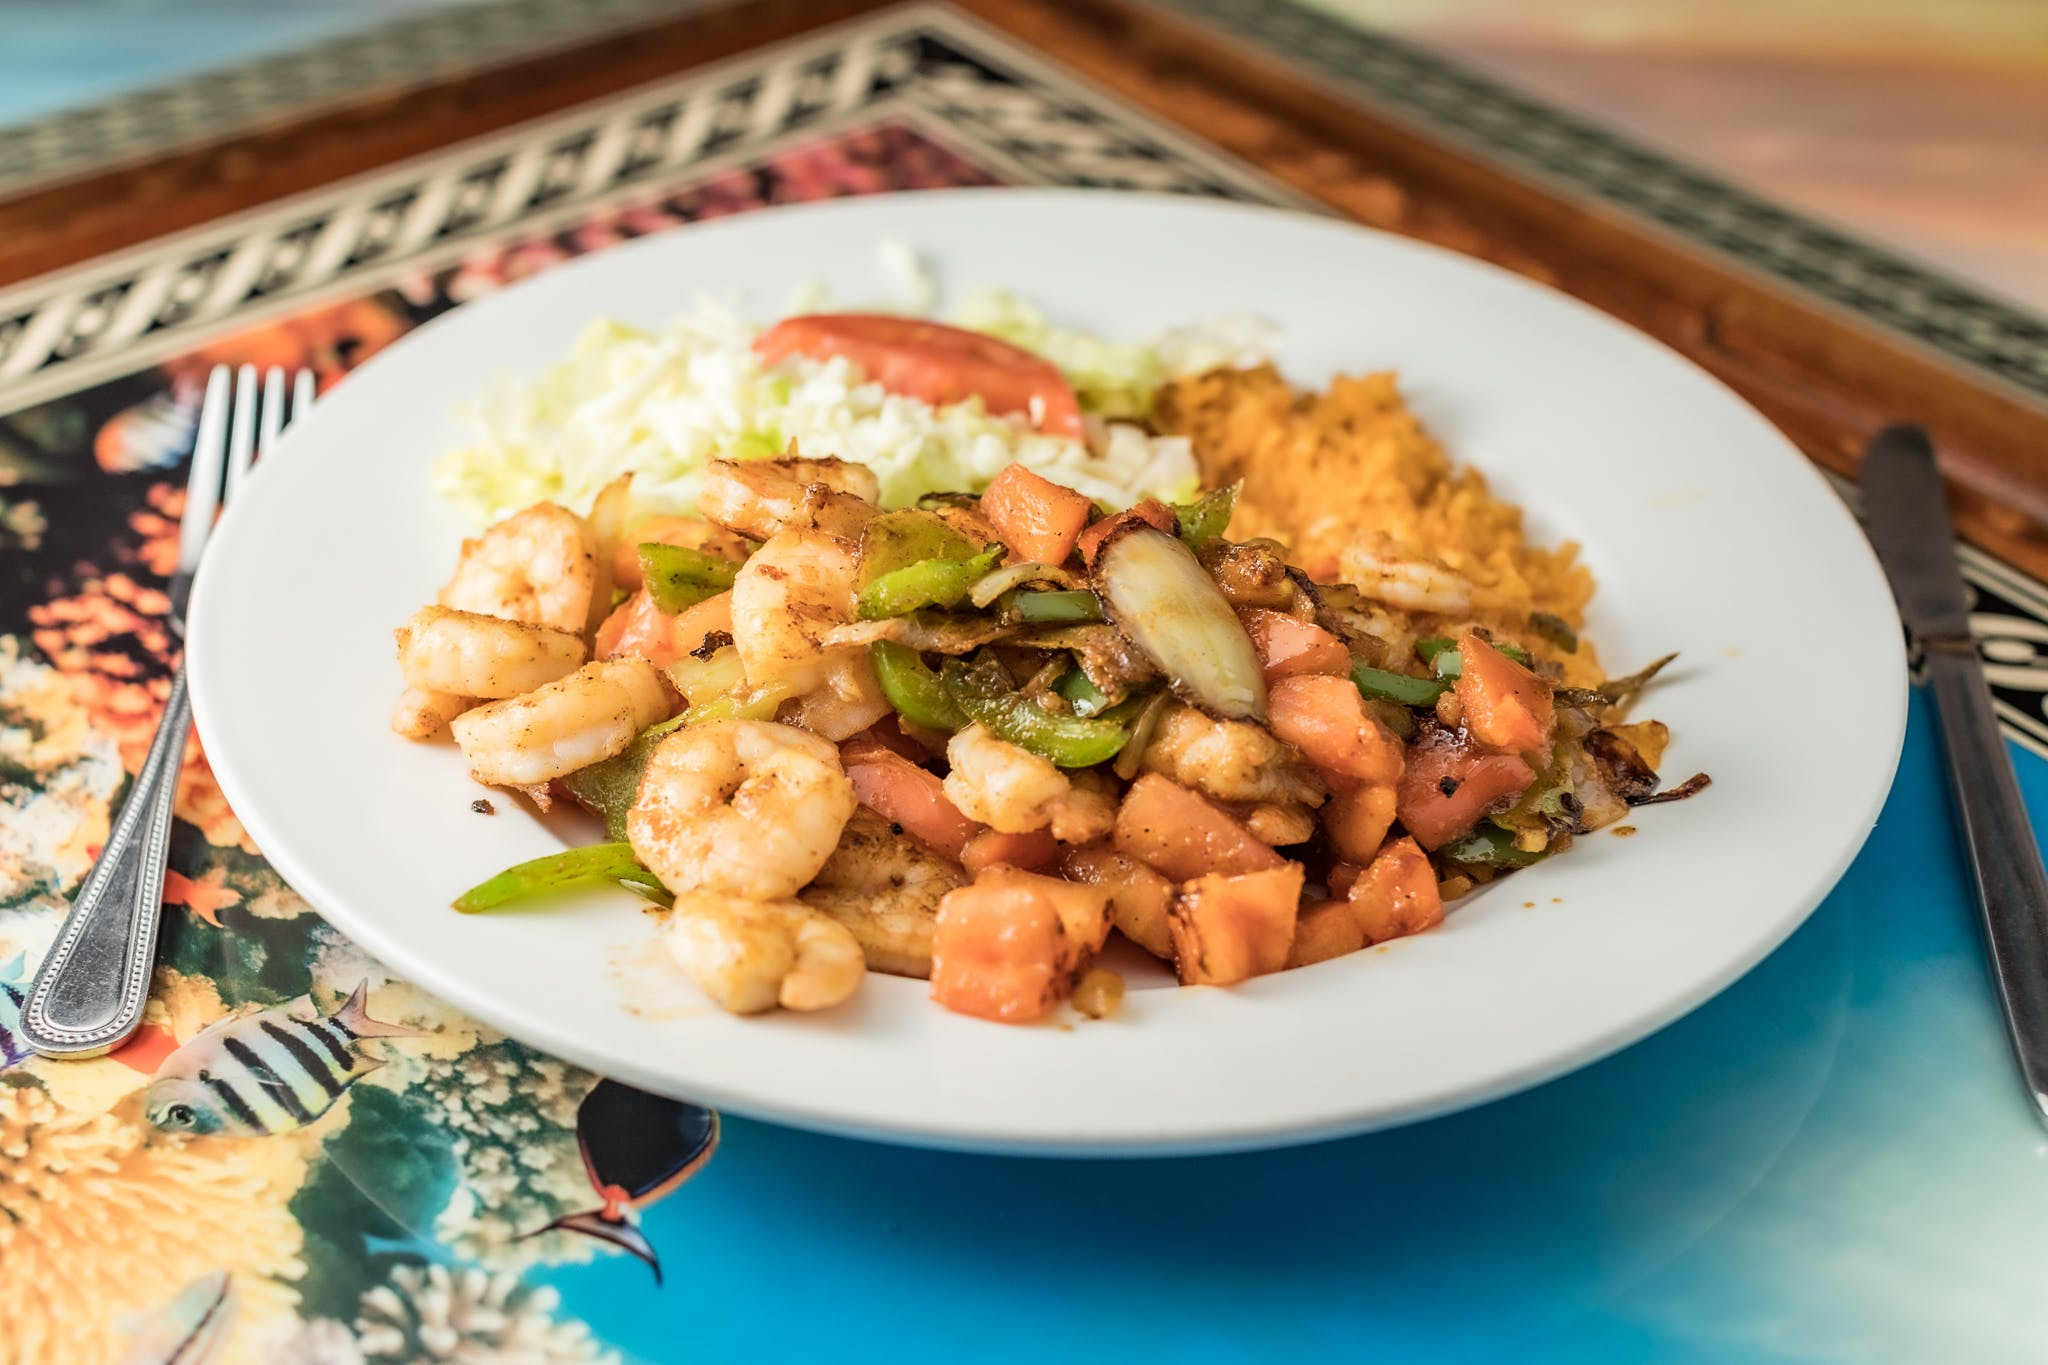 Shrimp Loco from Casa Vallarta Mexican Restaurant in Eau Claire, WI